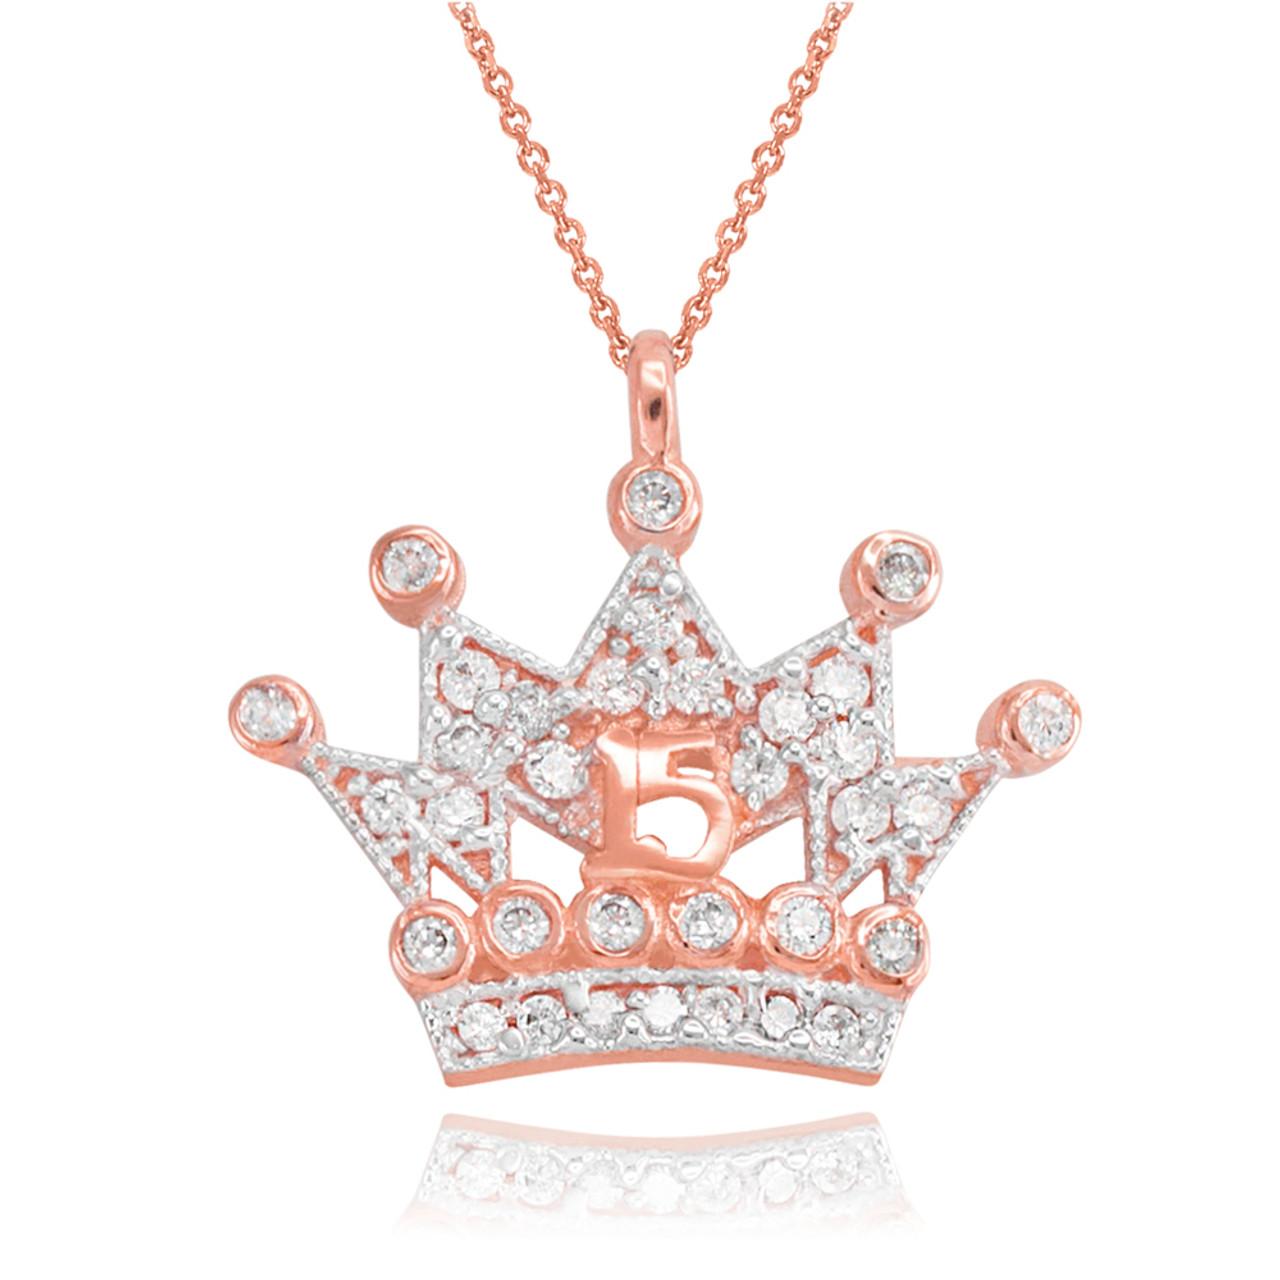 Gold quinceanera princess crown pendant necklace rose gold quinceanera princess crown pendant necklace aloadofball Gallery